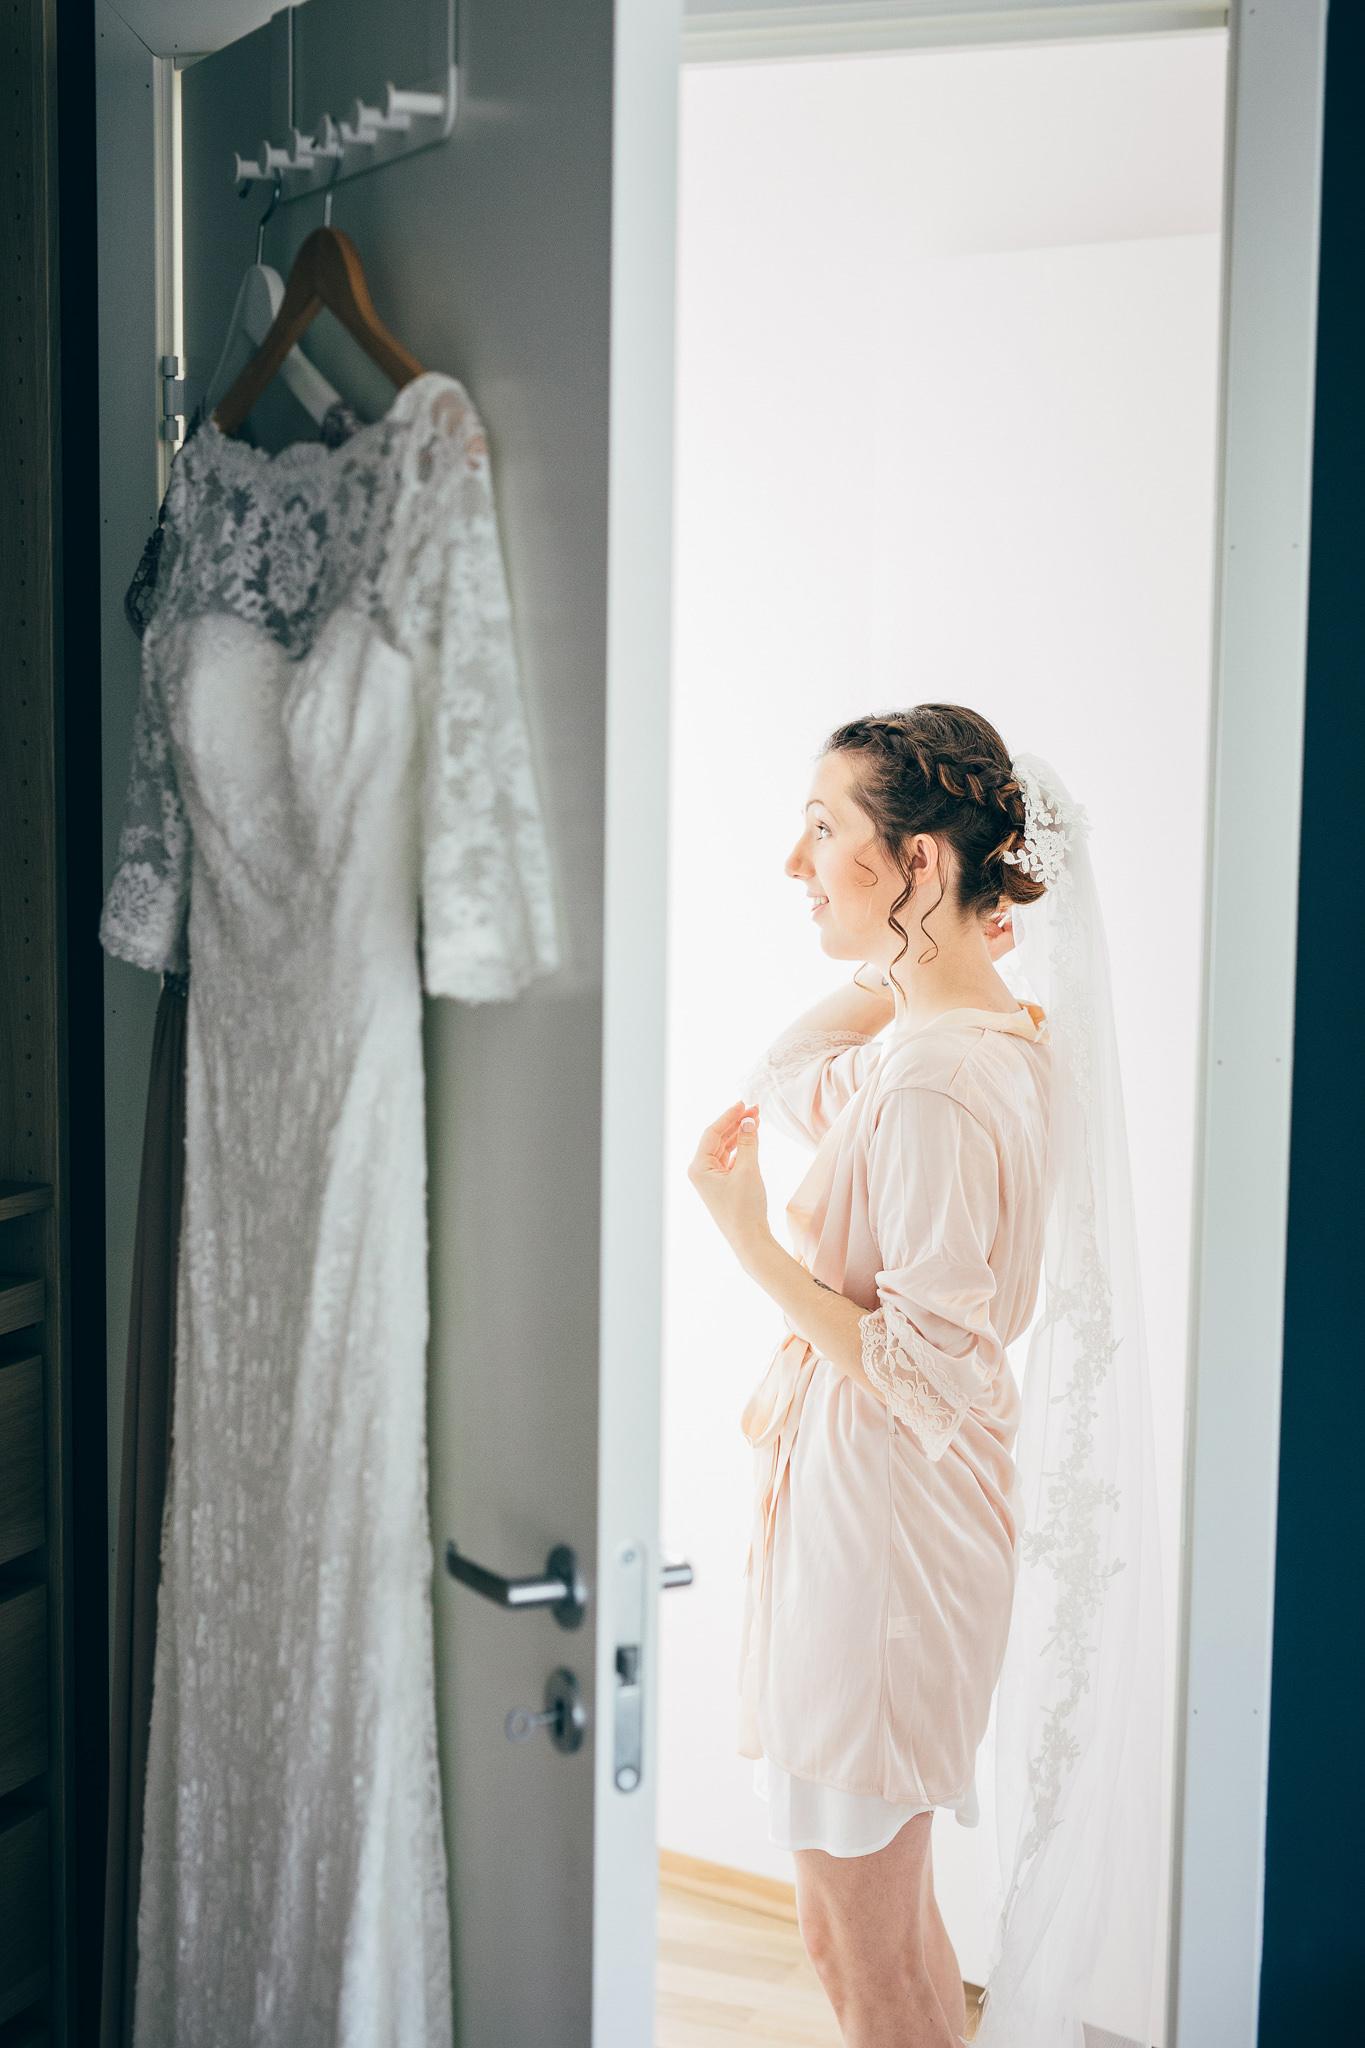 Norway+wedding+photographer+elopement+pre+wedding+Casey+Arneson-22.jpg